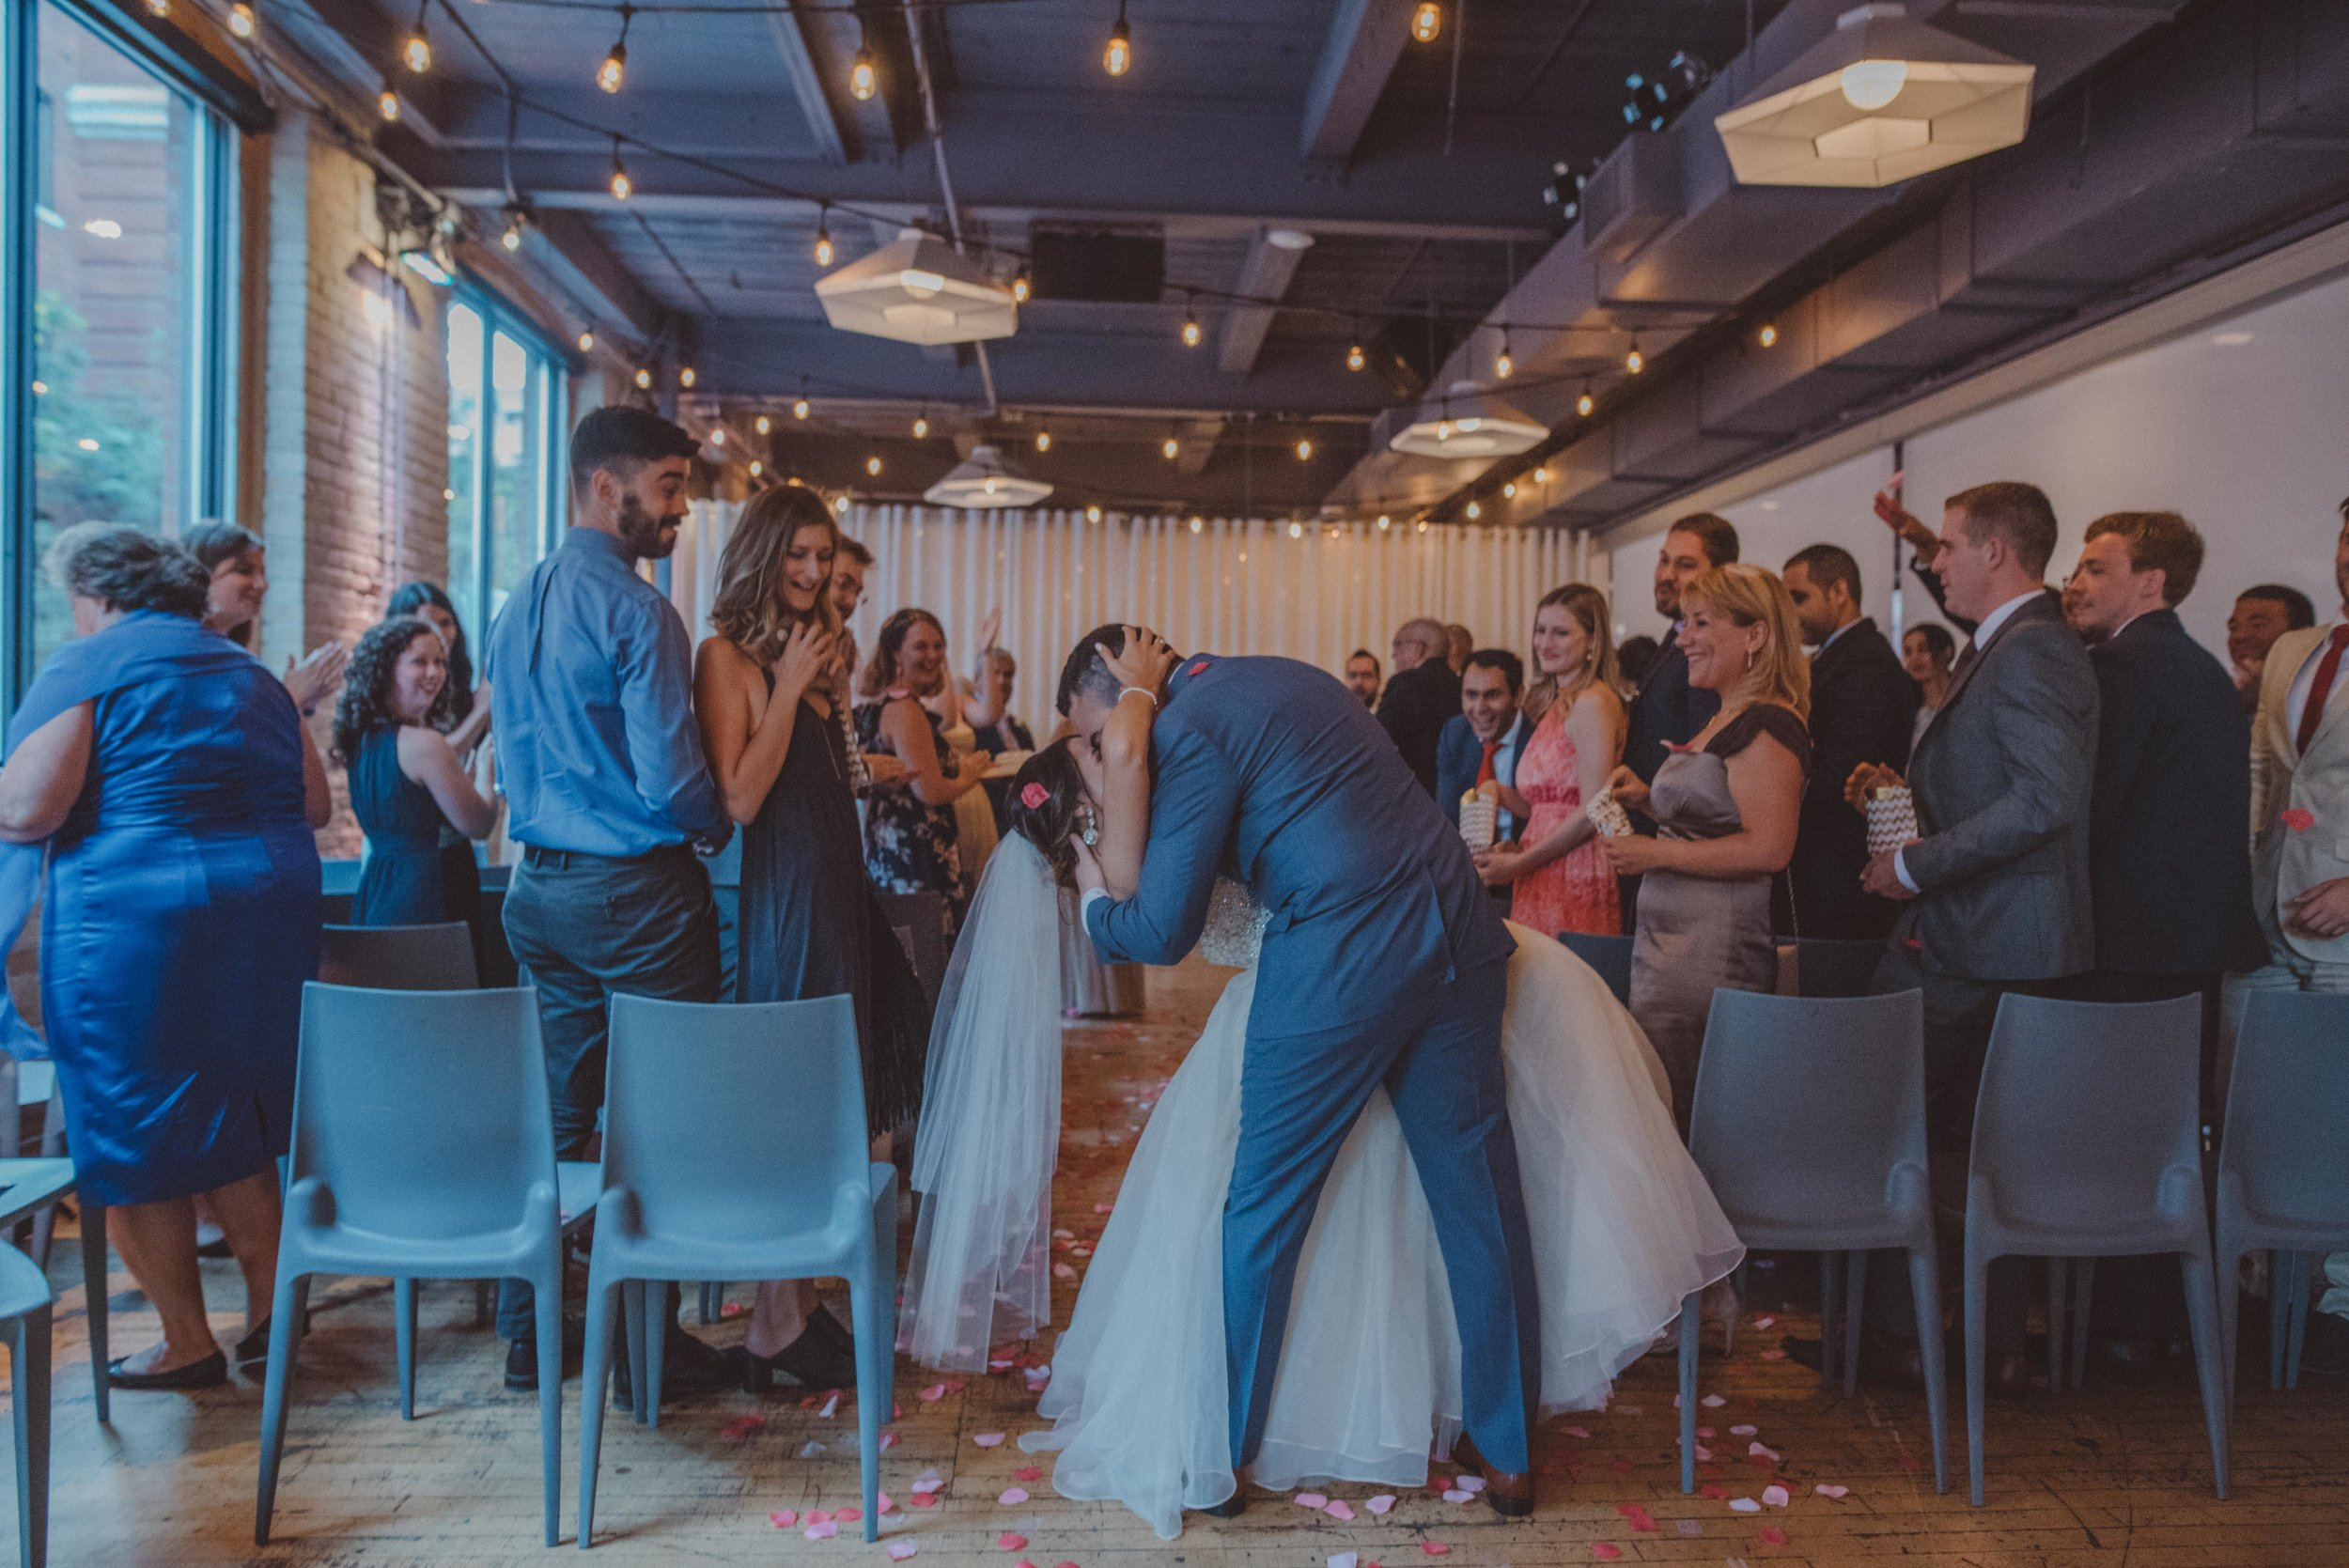 mariage_photographe_toronto_gatineau_ottawa_photographer_wedding-35.jpg